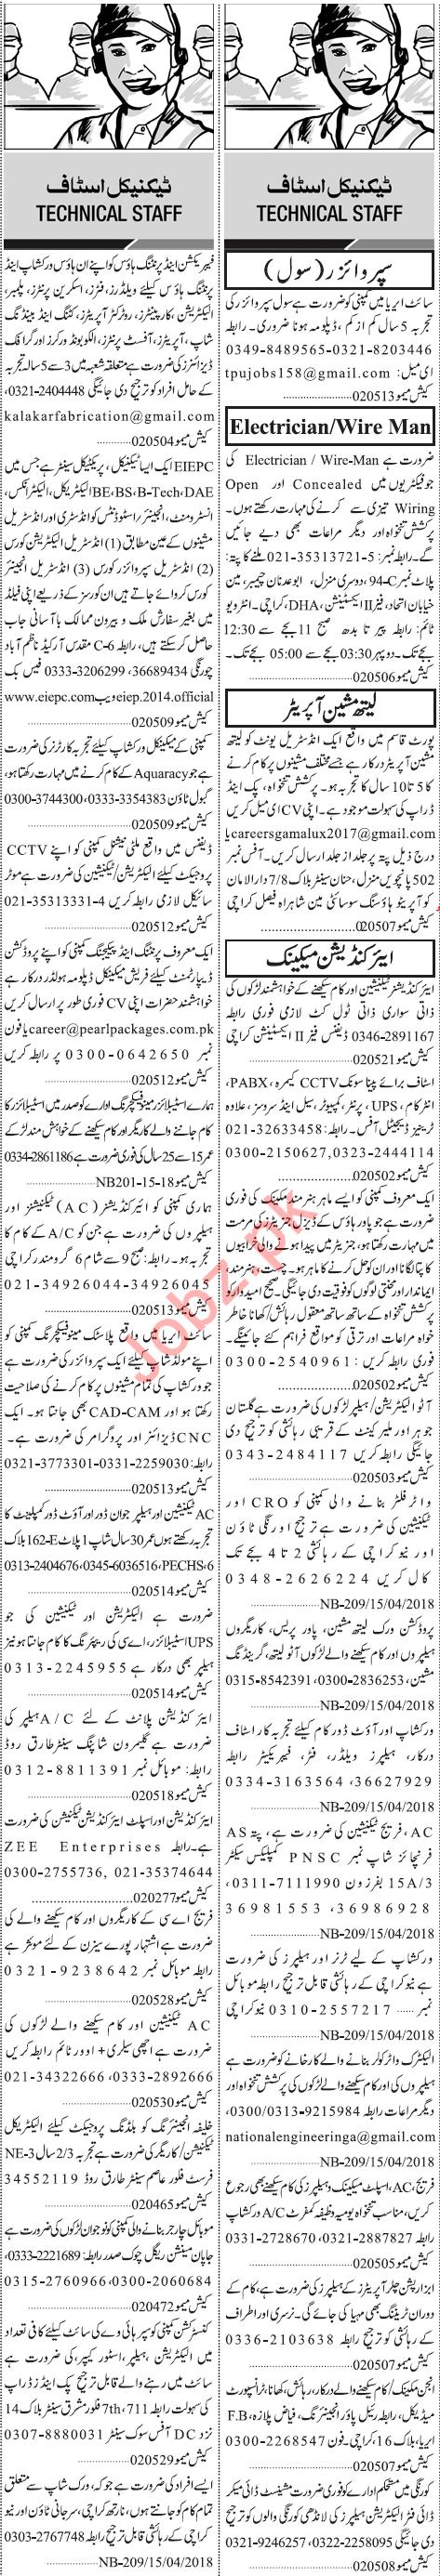 Technical Staff Jobs in Karachi